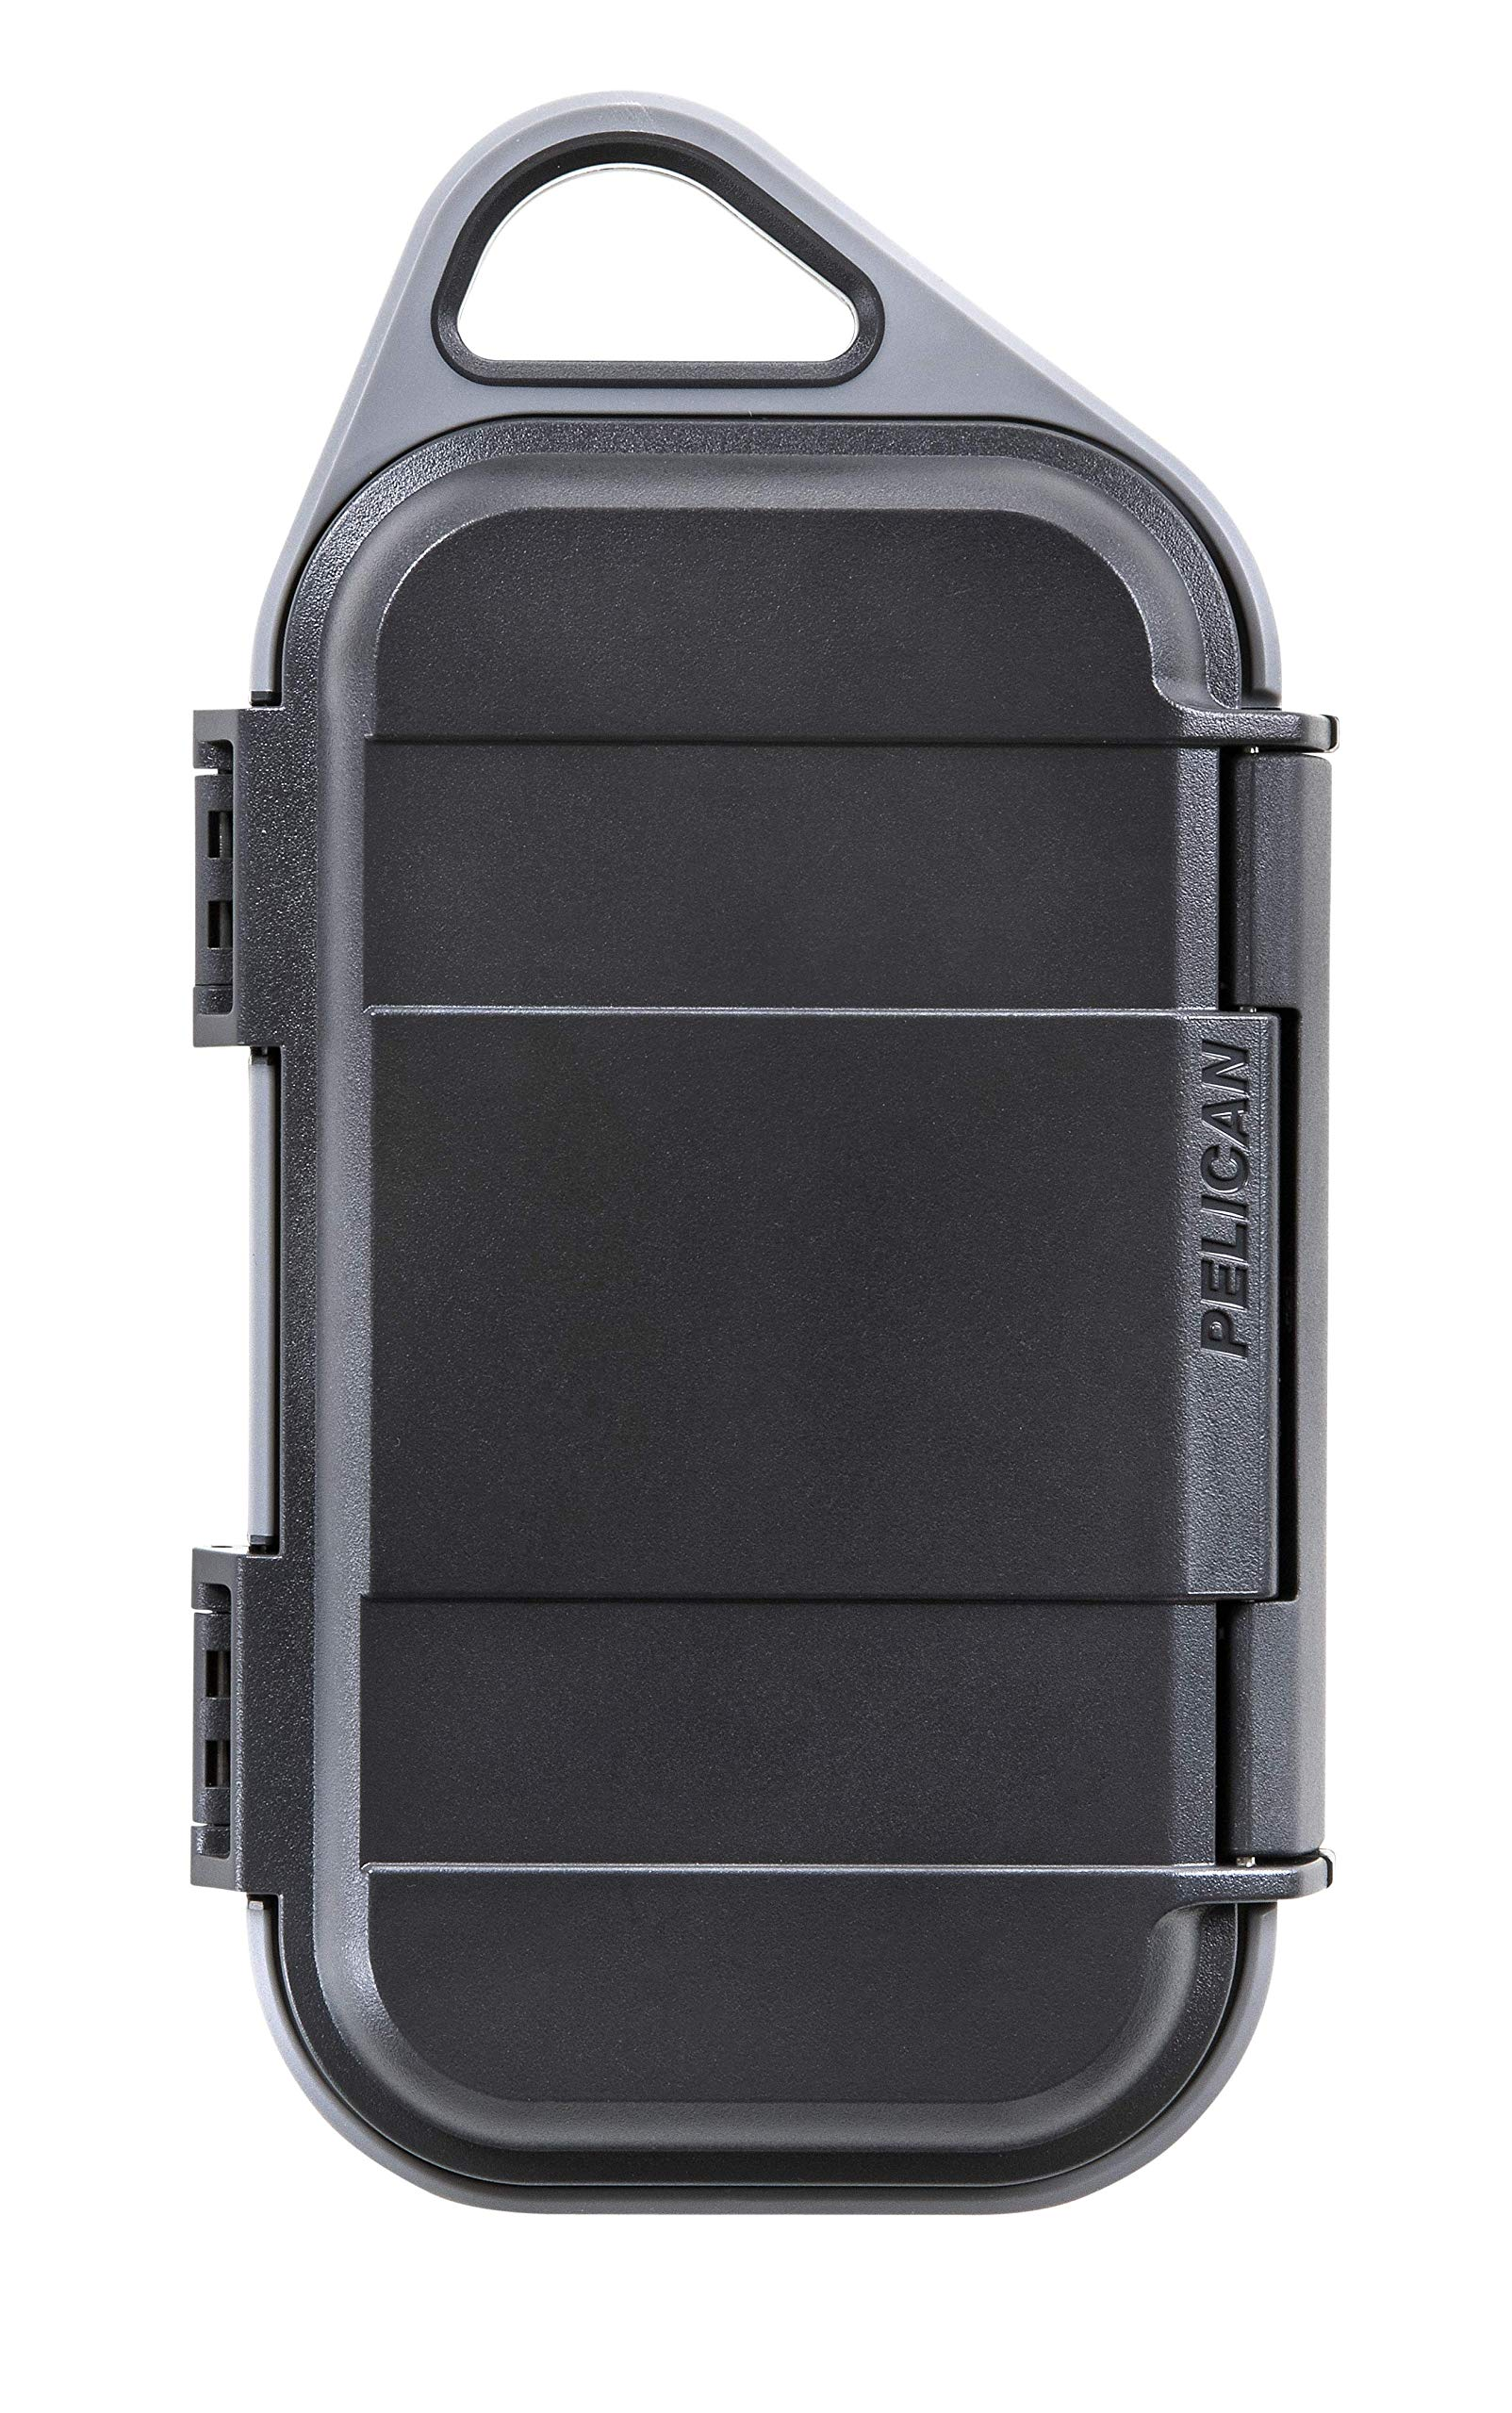 Pelican Go G40 Case - Waterproof Case (Anthracite/Grey) by Pelican